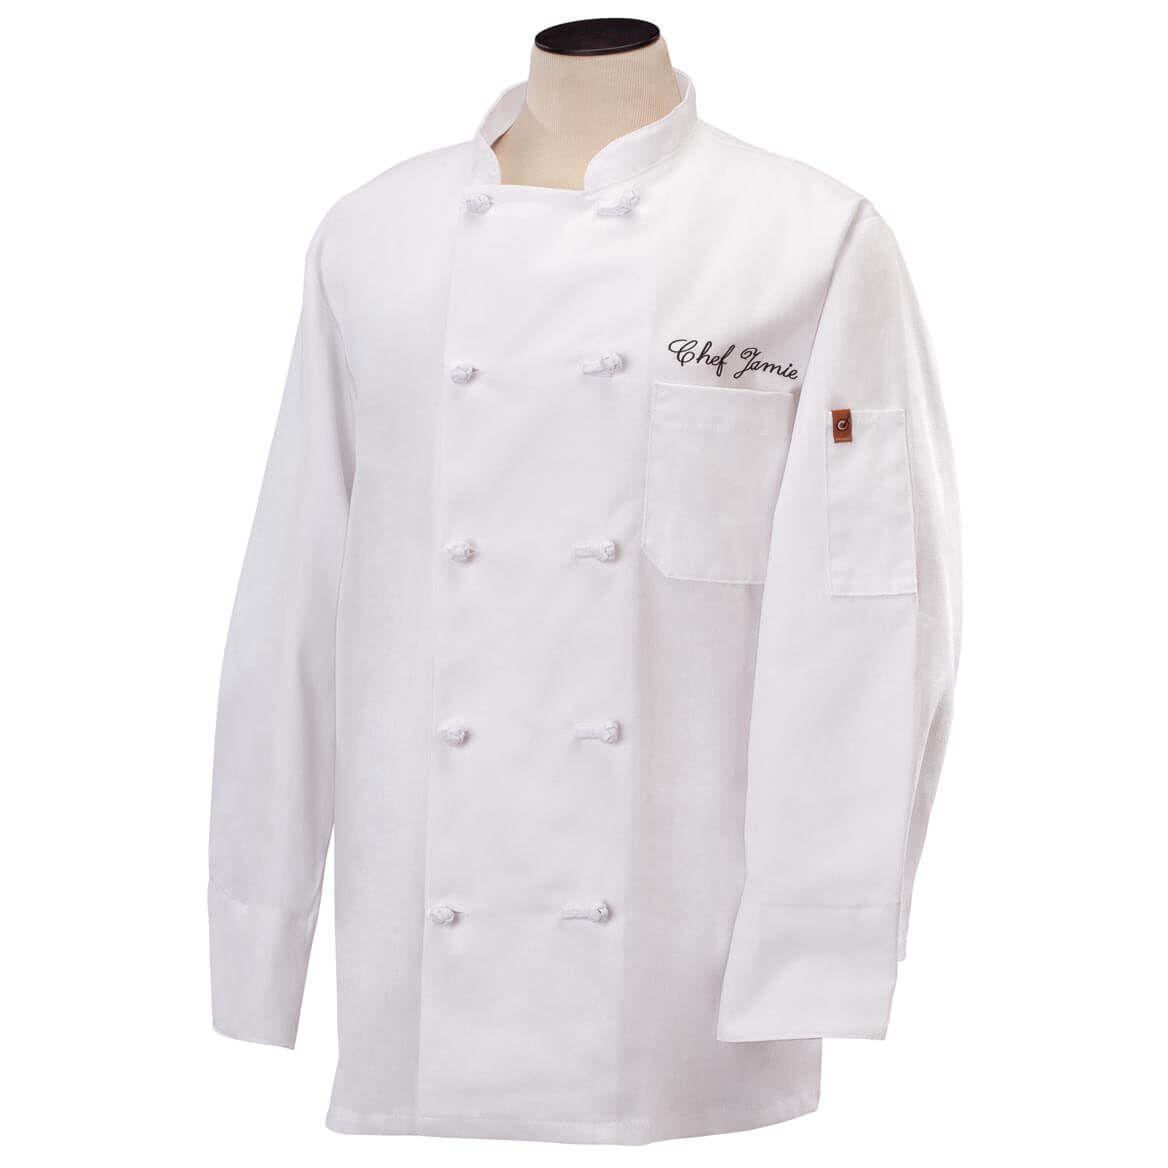 Personalized Chef Jacket White-328131